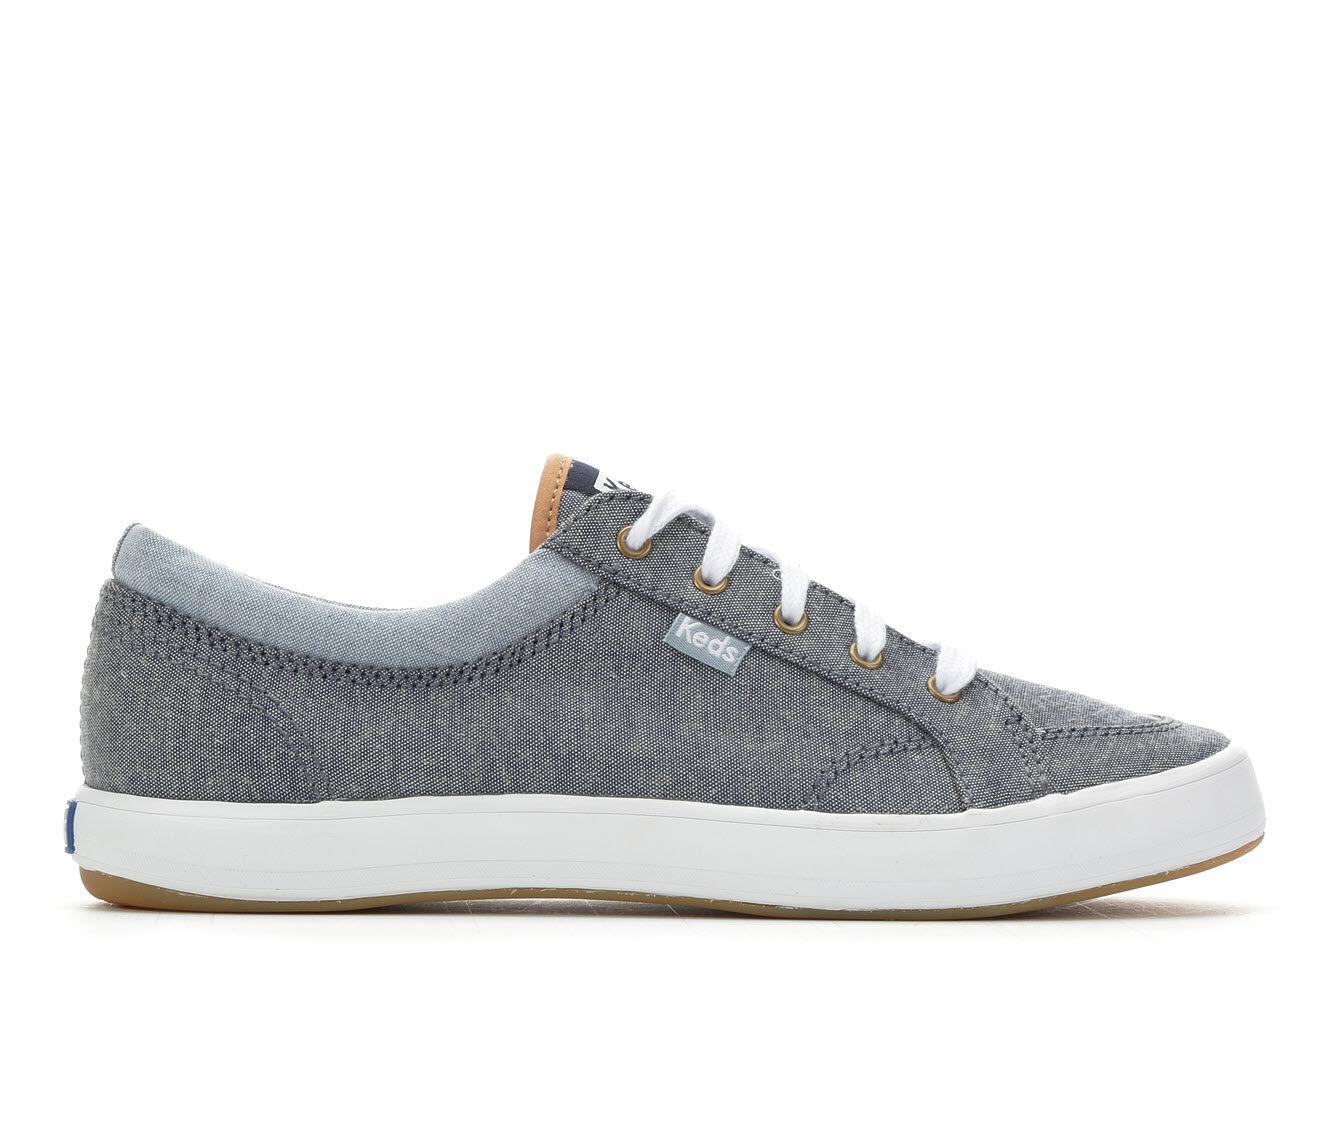 Women's Keds Center Denim Sneakers Blue